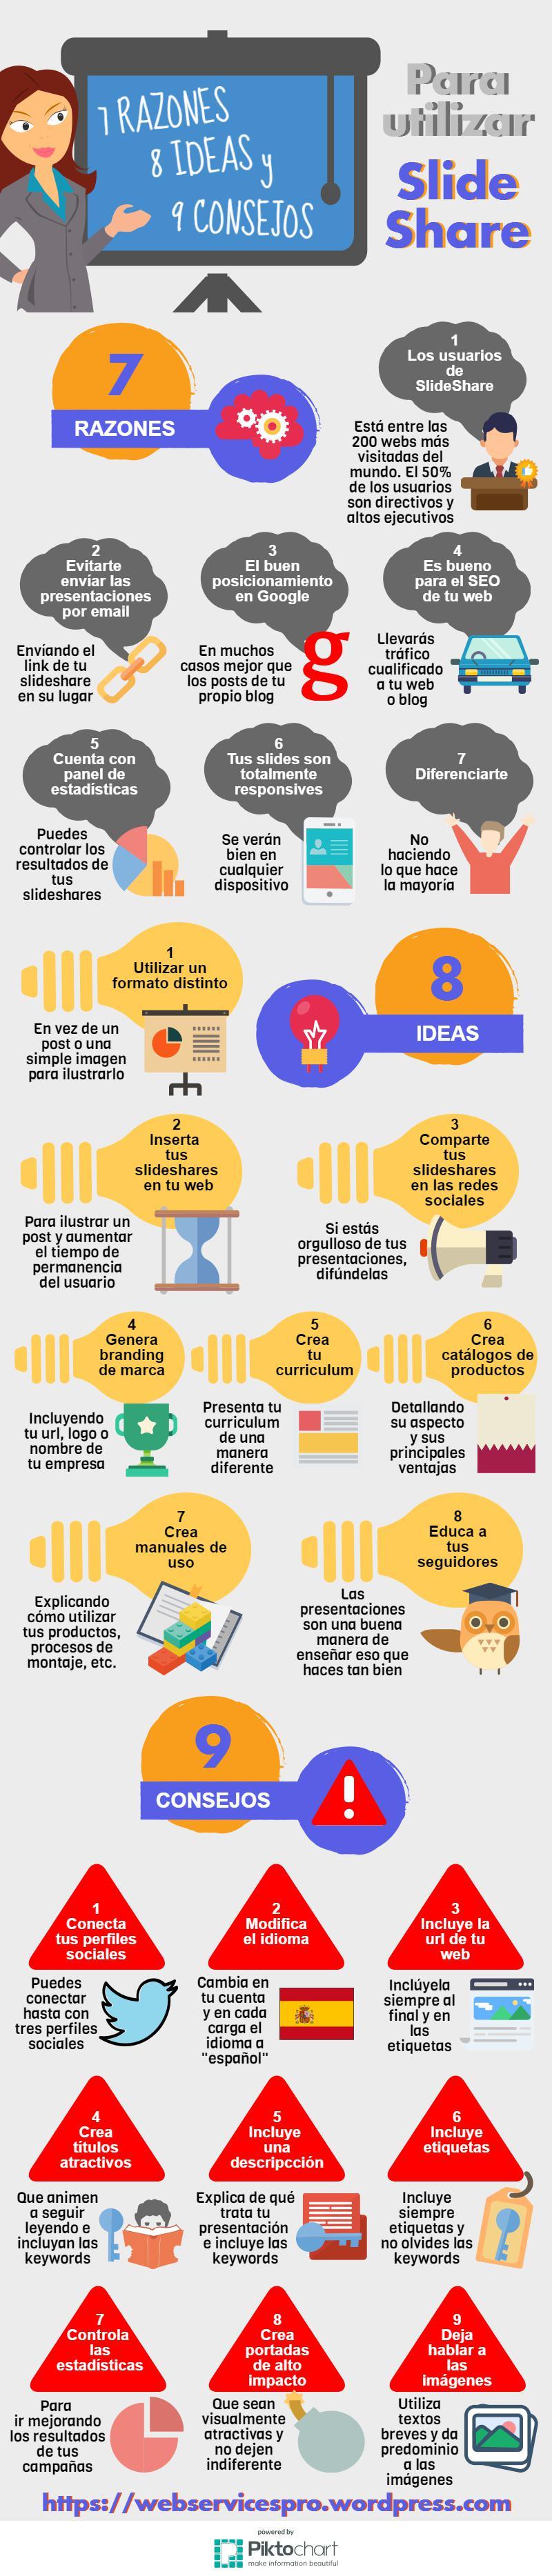 7 Razones-8 ideas-9 consejos para utilizar SlideShare